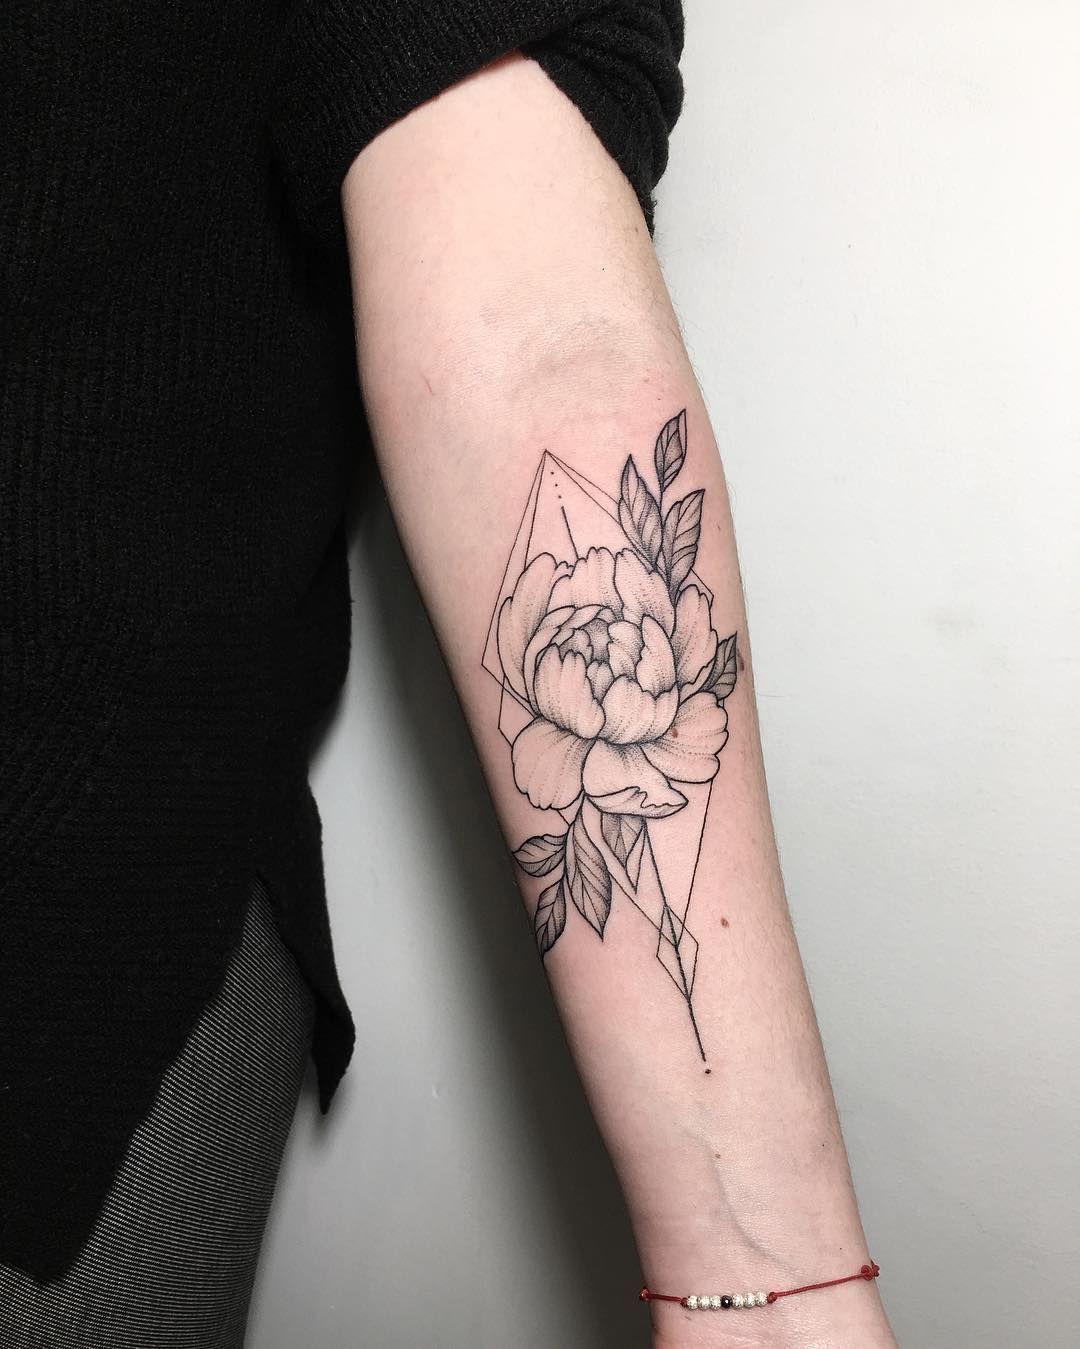 Floral And Geometric Tattoo By Ira Shmarinova Geometric Flower Tattoo Geometric Tattoo Tattoo Arm Designs